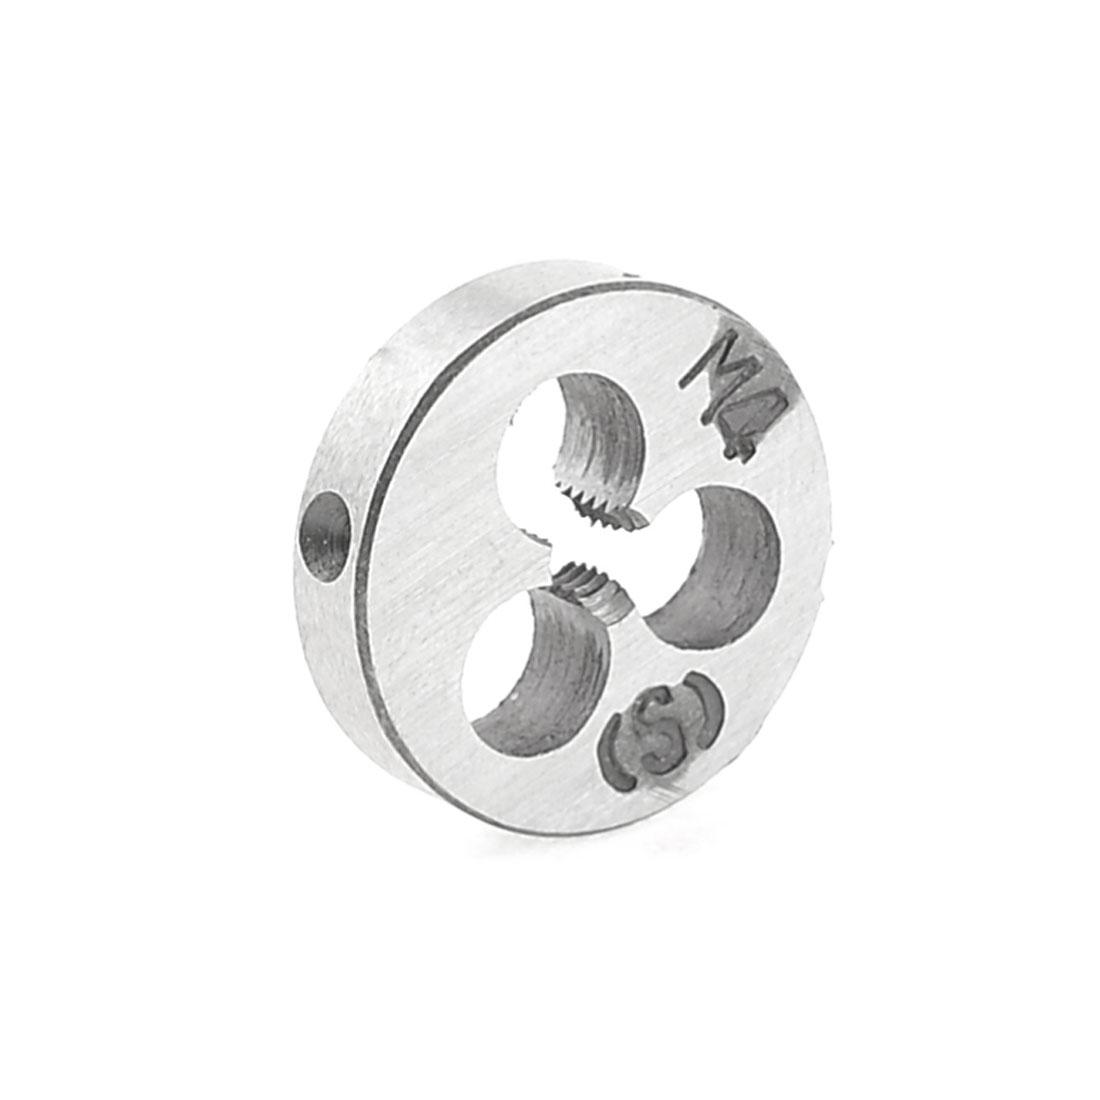 20mm Outer Dia M4 4mm Diameter Round Thread Die Hand Tool Part